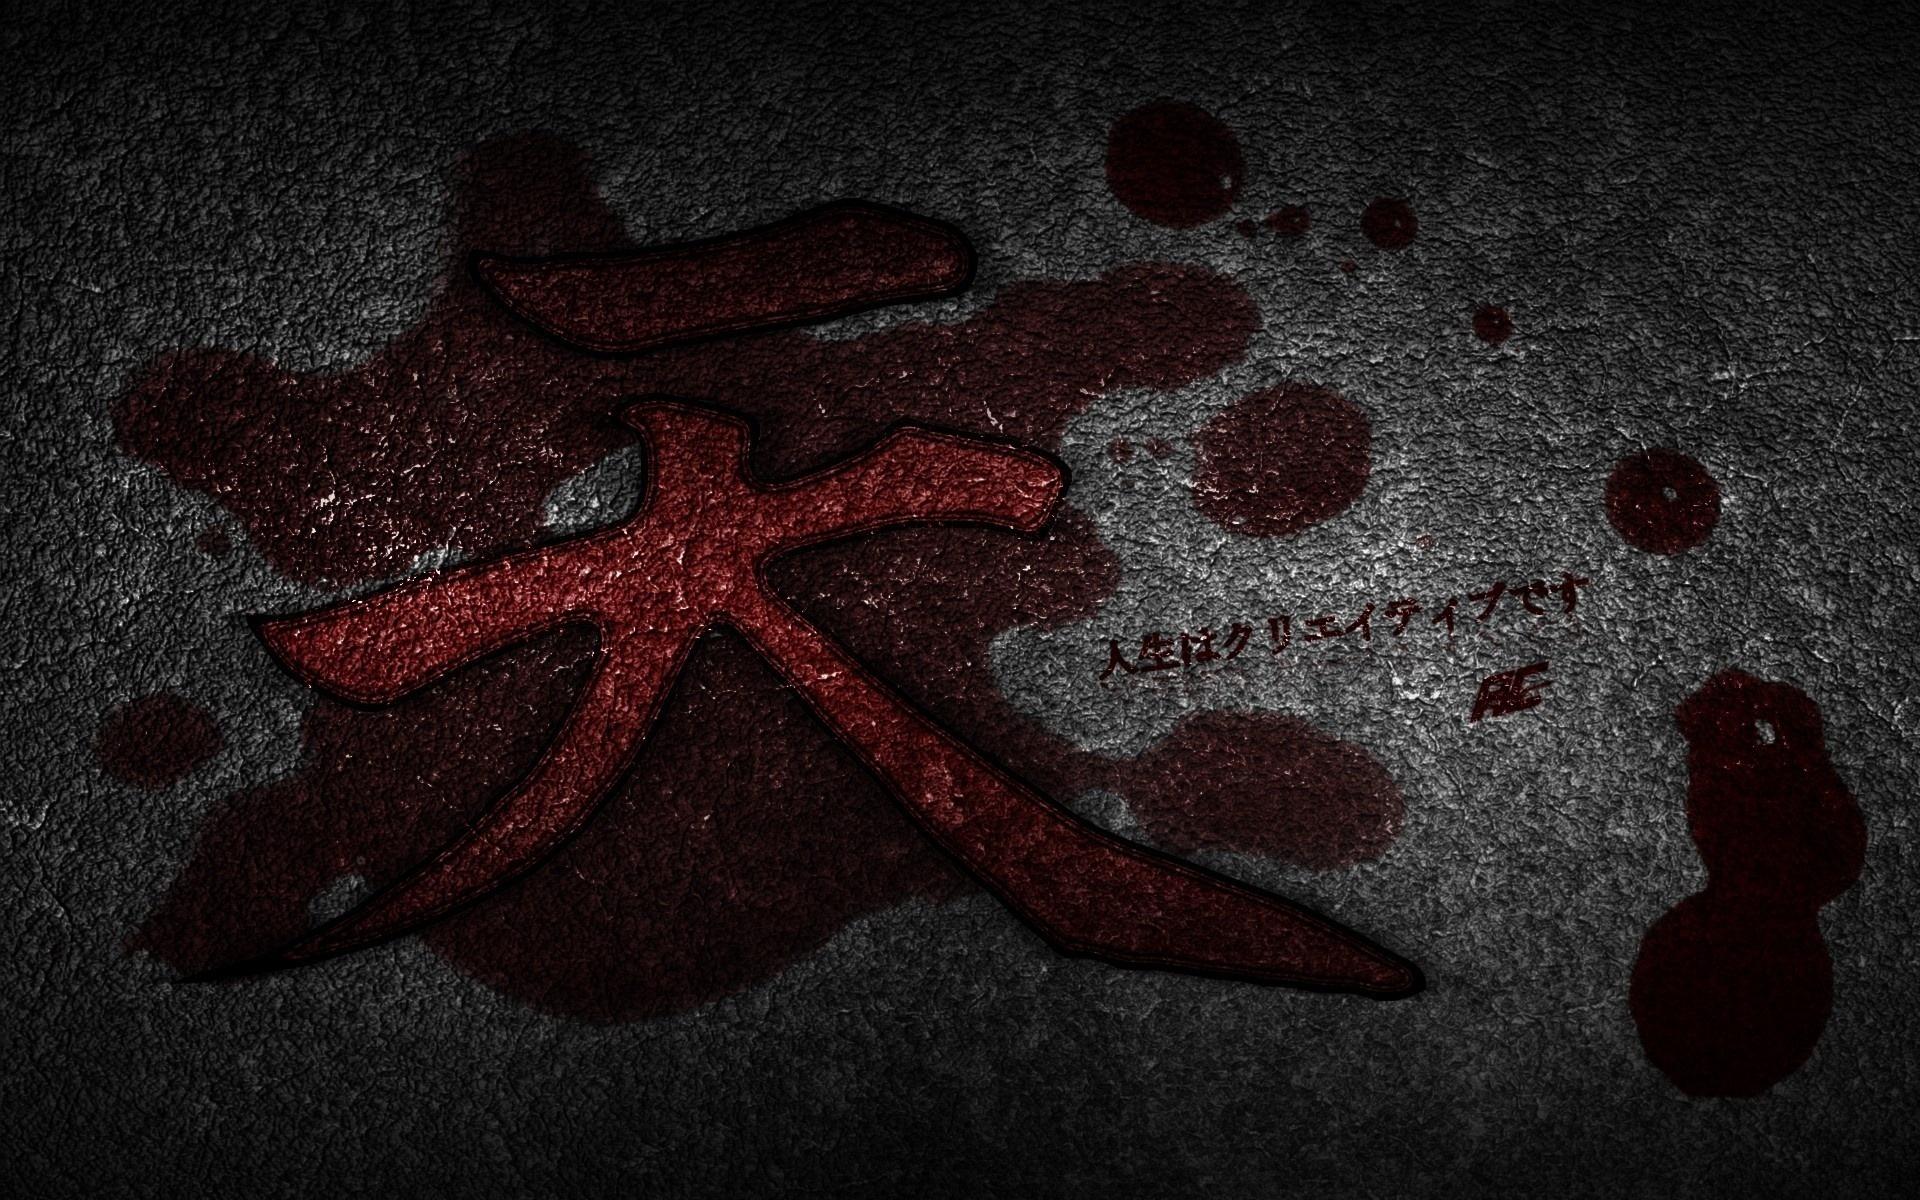 chinese dragon wallpaper hd 1080p